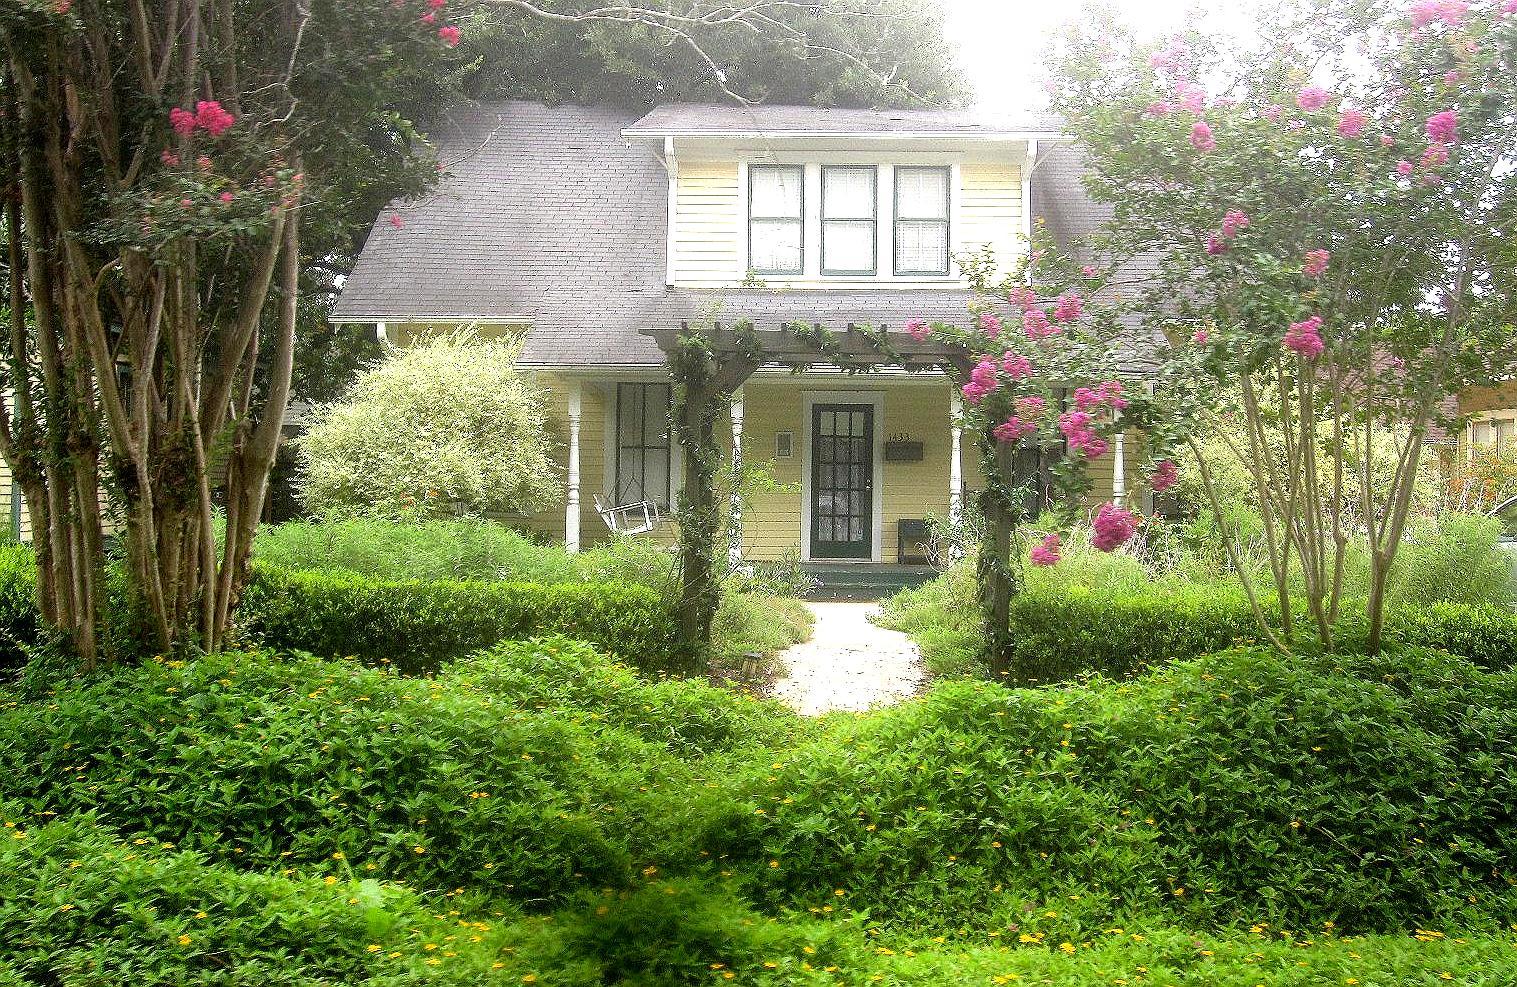 The OtHeR HoUsToN: BUNGALOW FRONT YARD GARDEN IDEAS on Bungalow Backyard Ideas id=30194